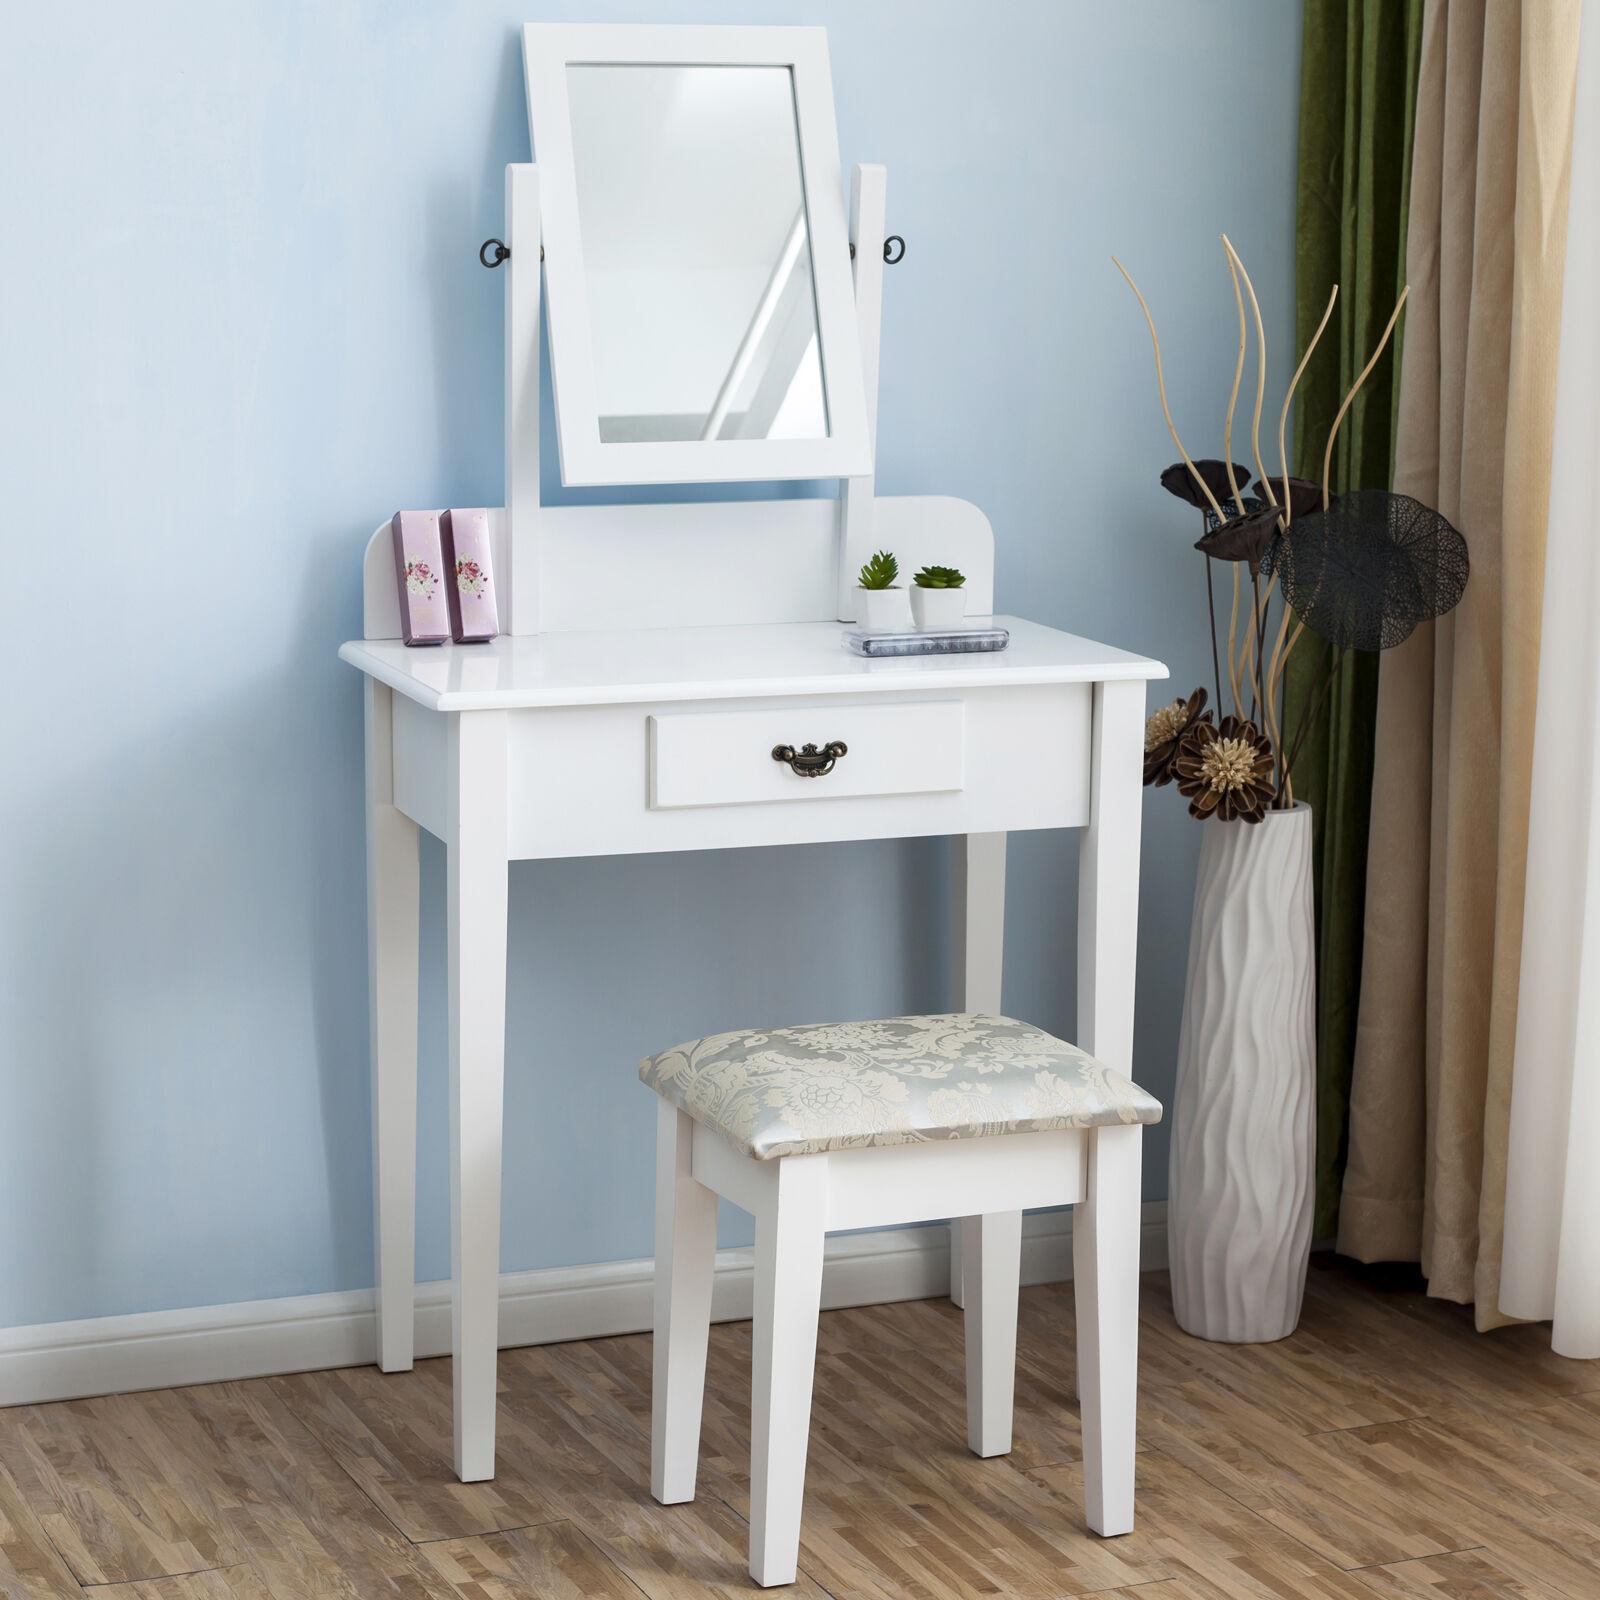 rectangle mirror dressing table makeup desk white stool